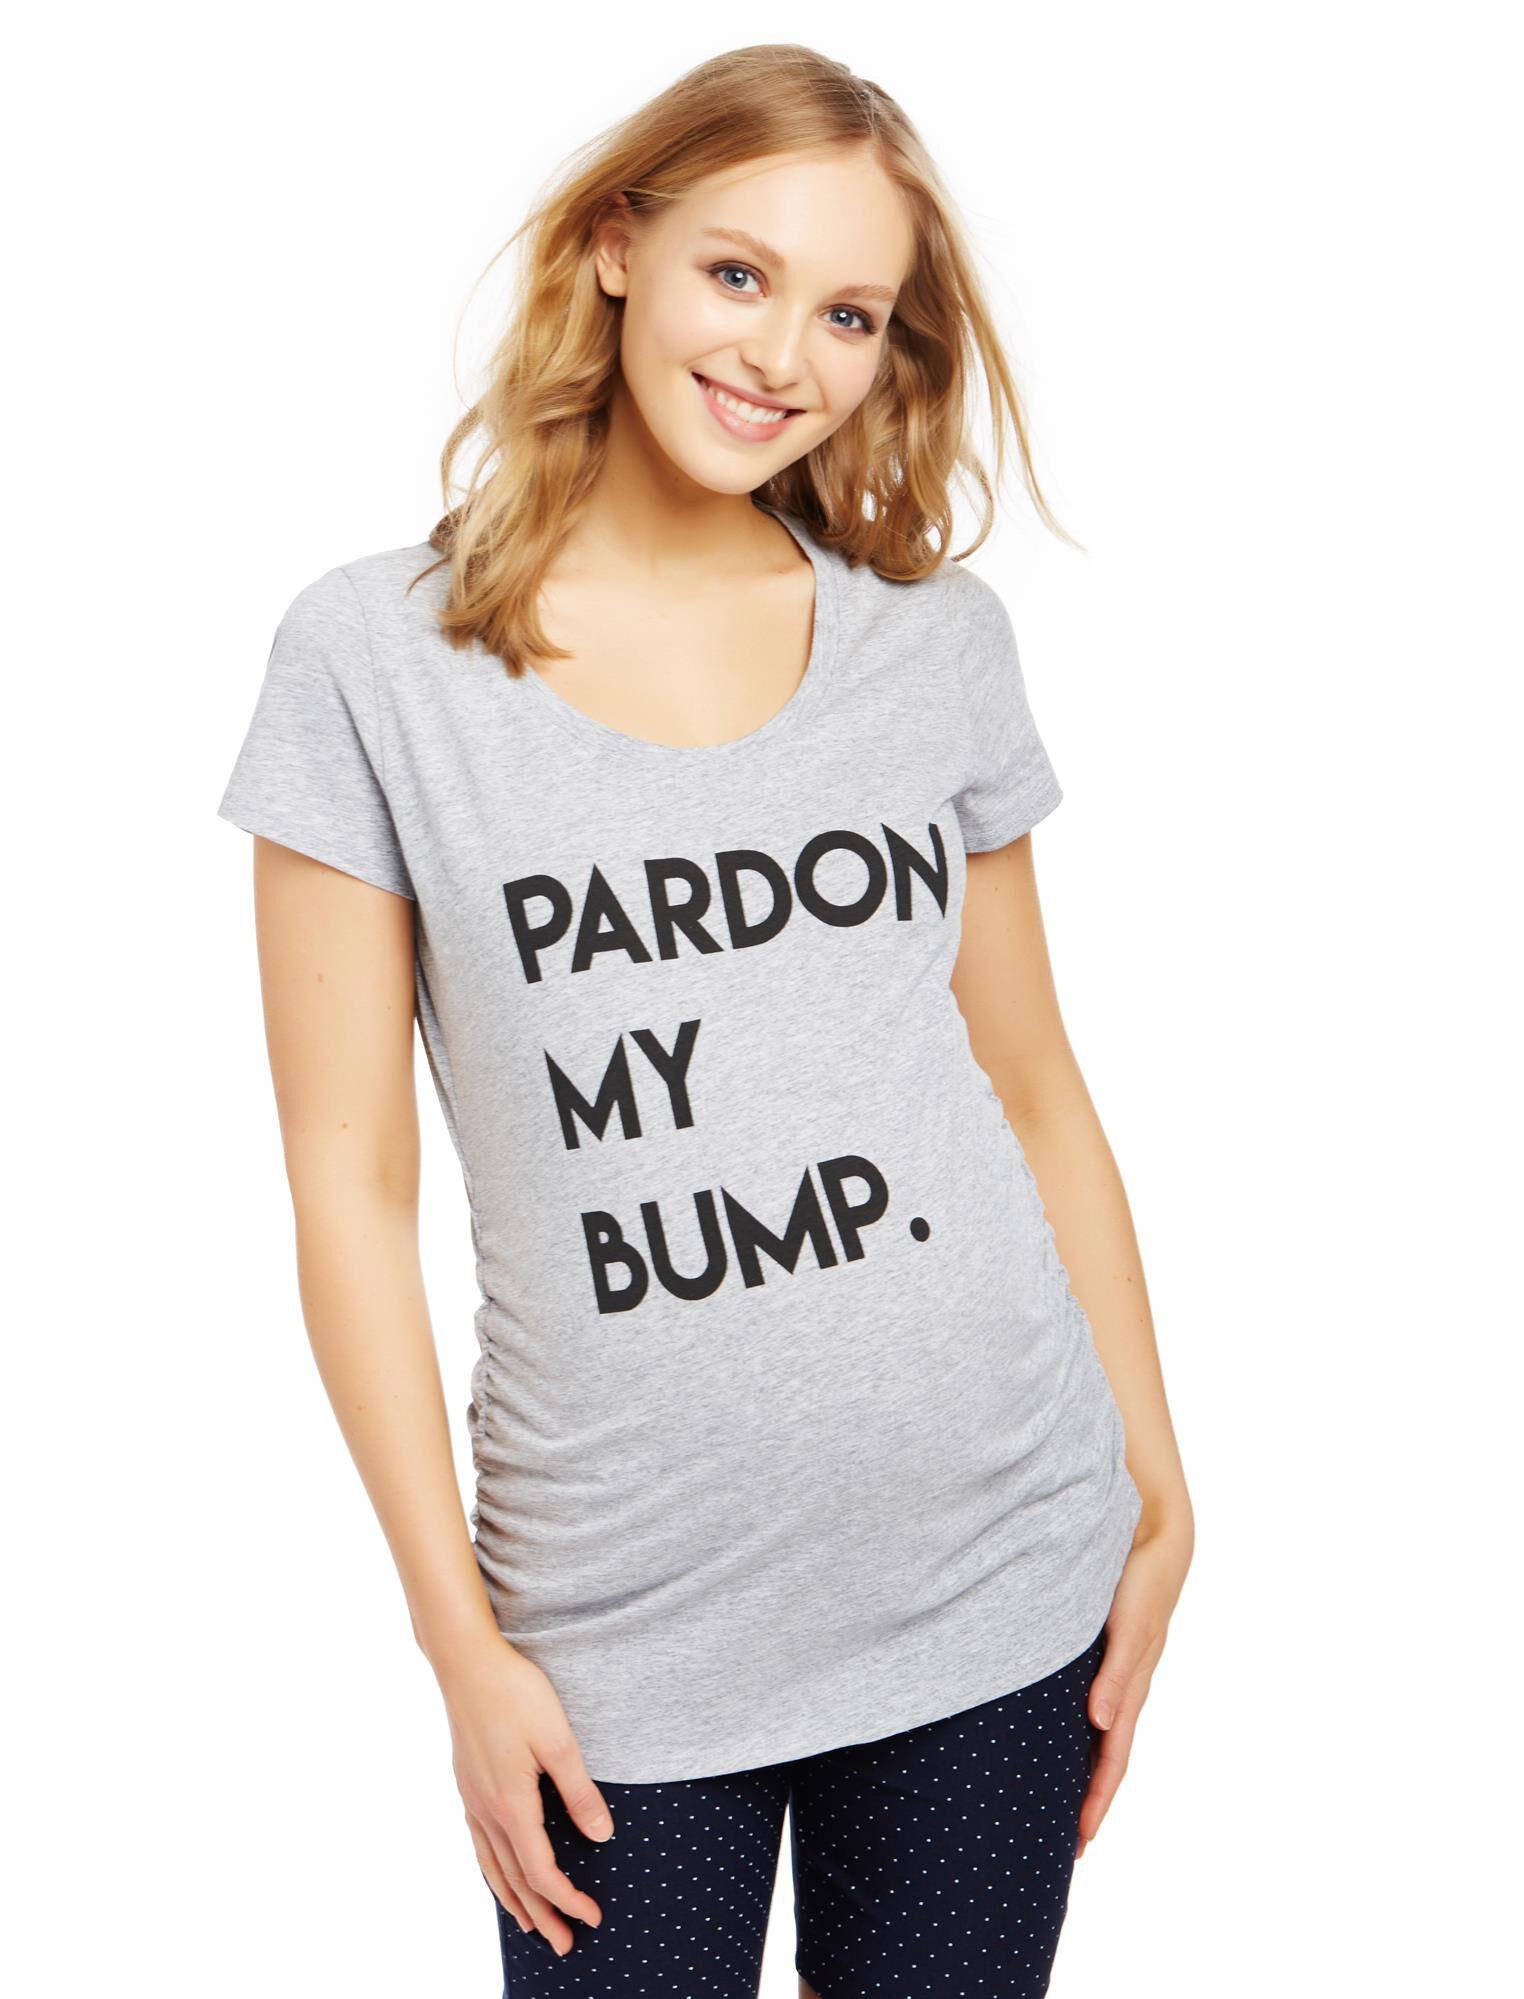 Pardon My Bump Maternity Tee